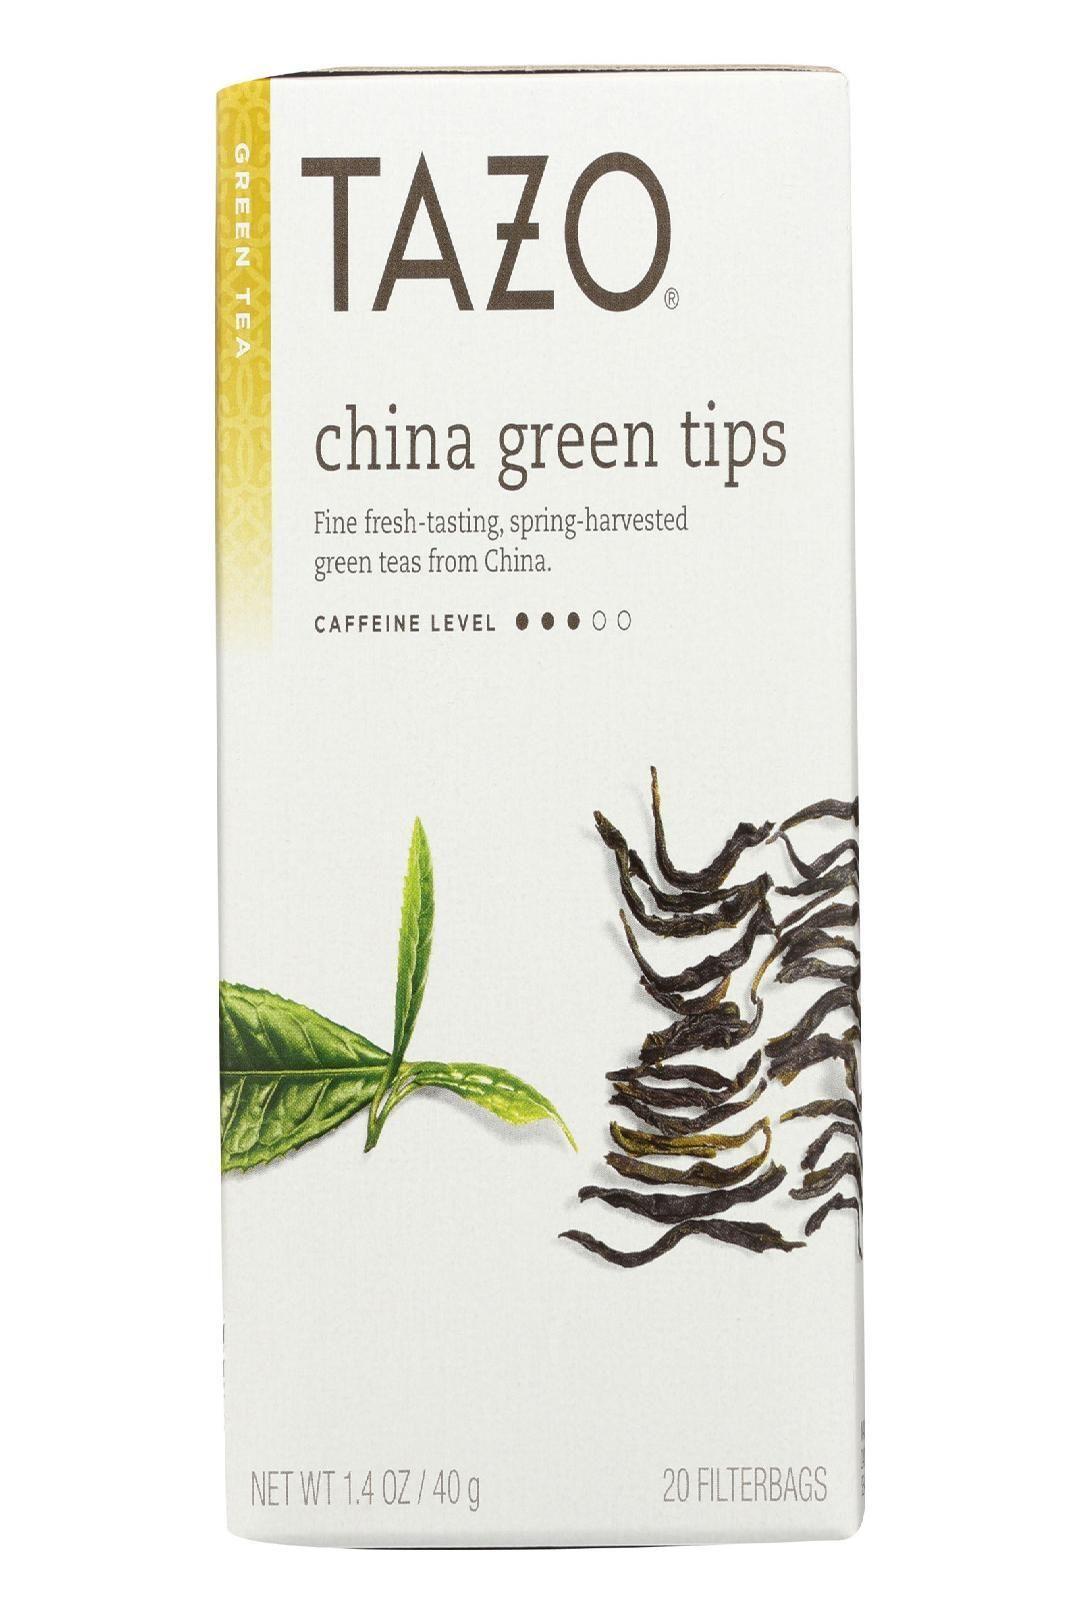 Tazo Tea Green Tea China Tips Case Of 6 20 Bag